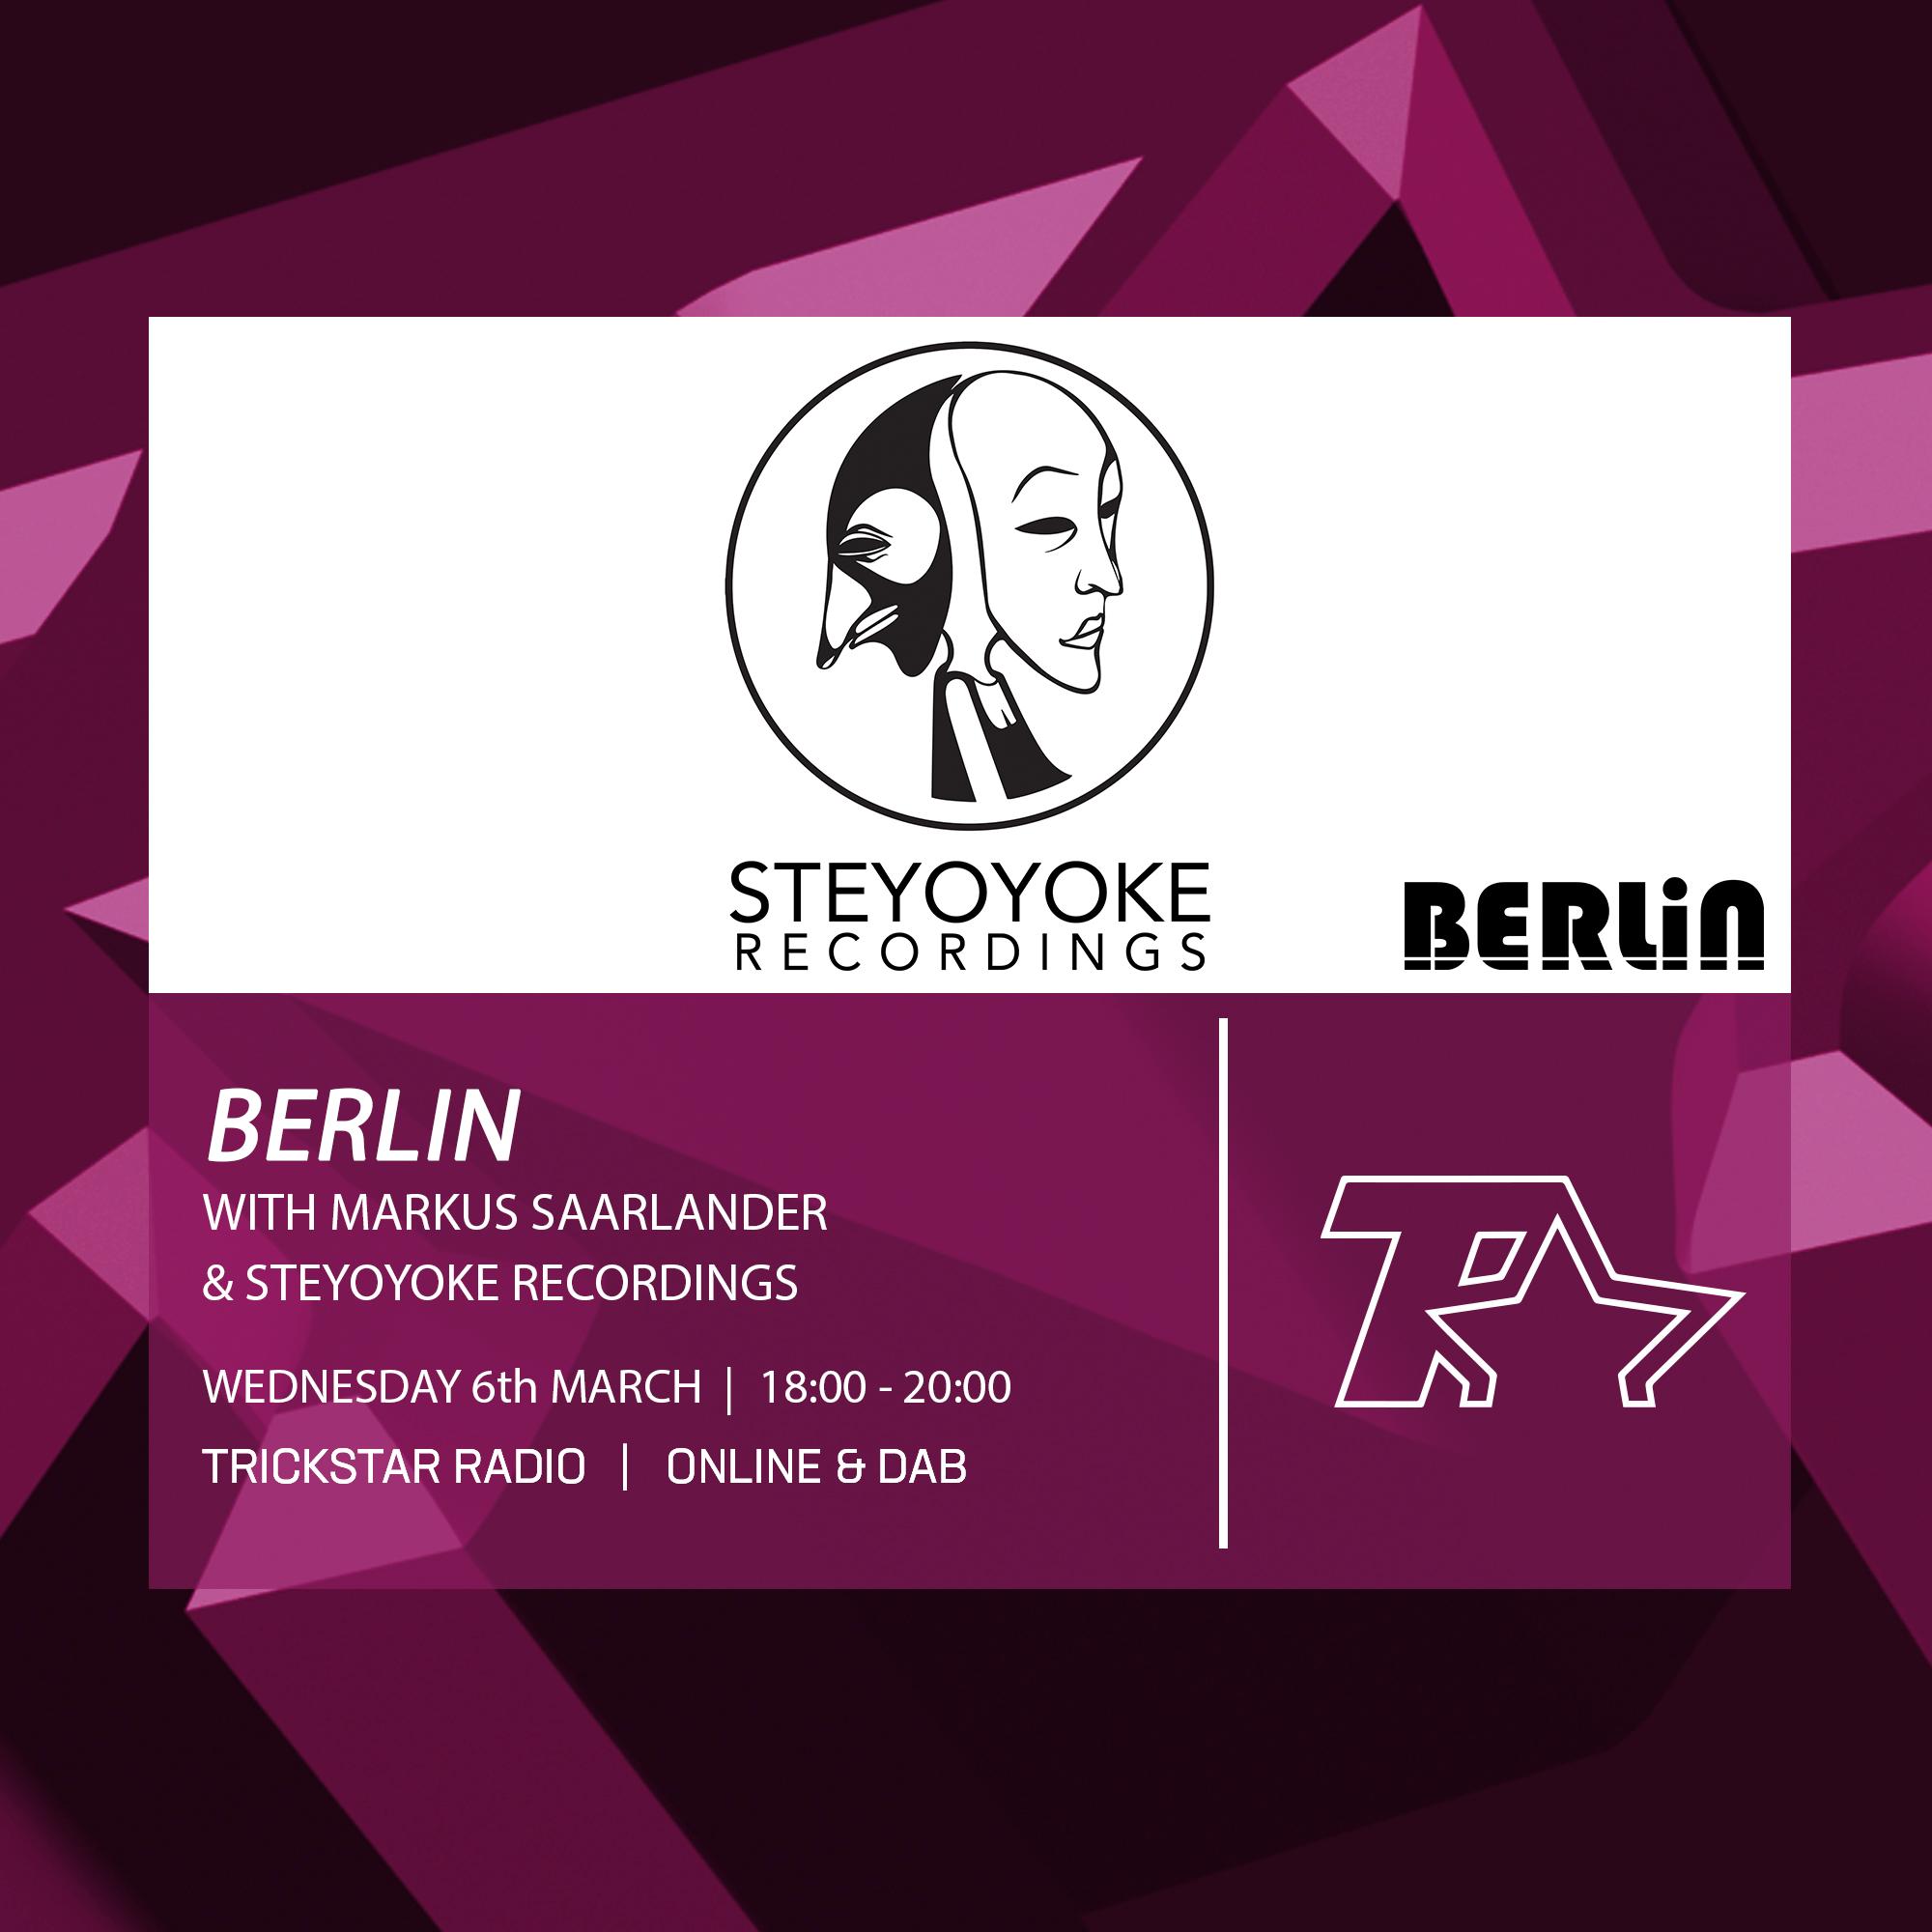 Berlin Steyoyoke Recordings